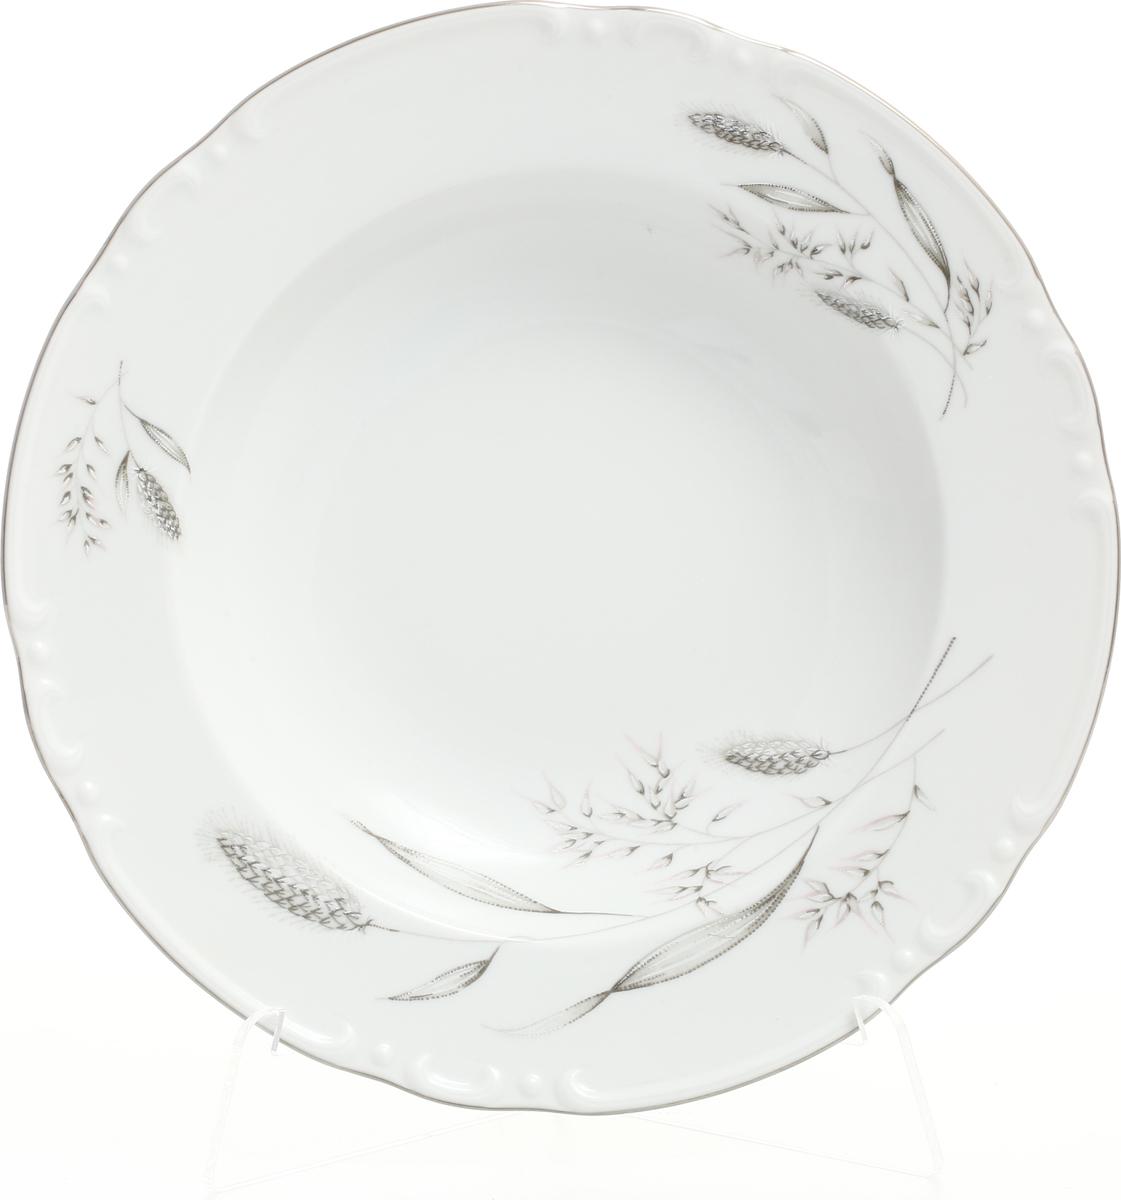 "Набор тарелок глубоких Thun ""Констанция. Серебряные колосья"", диаметр 23 см, 6 шт"